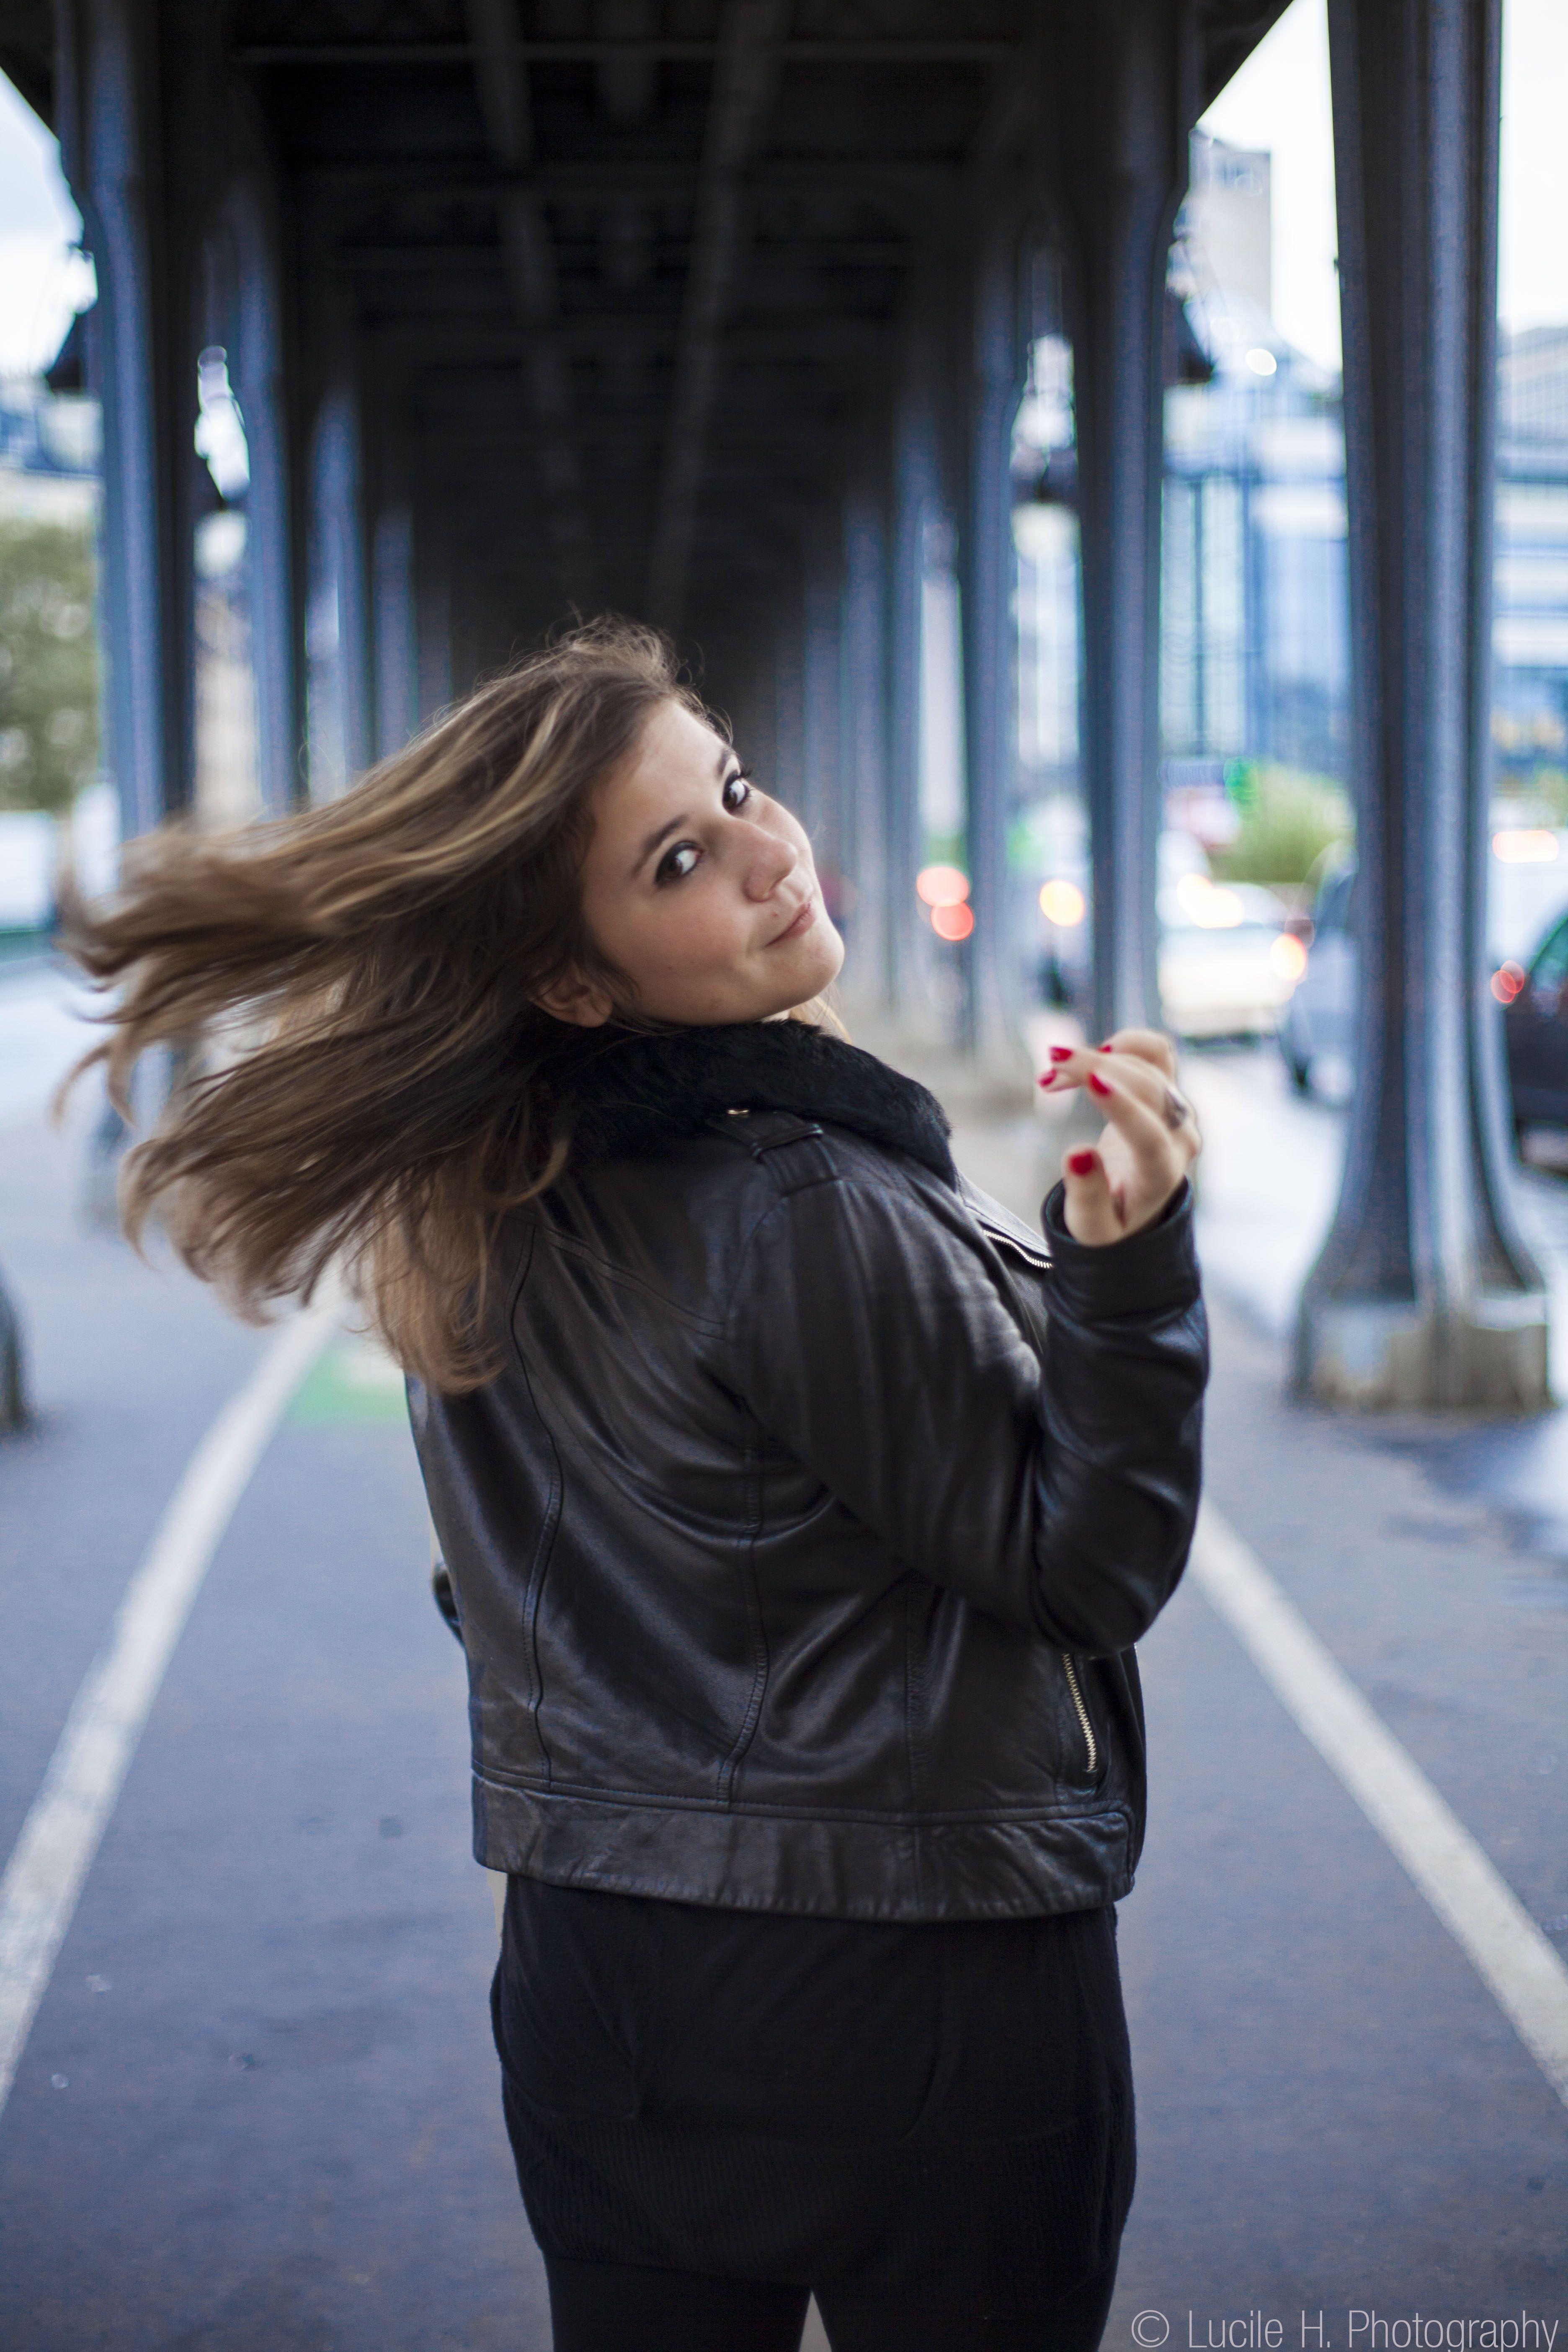 Paris. Visit my website: www.lucileh-studio.com